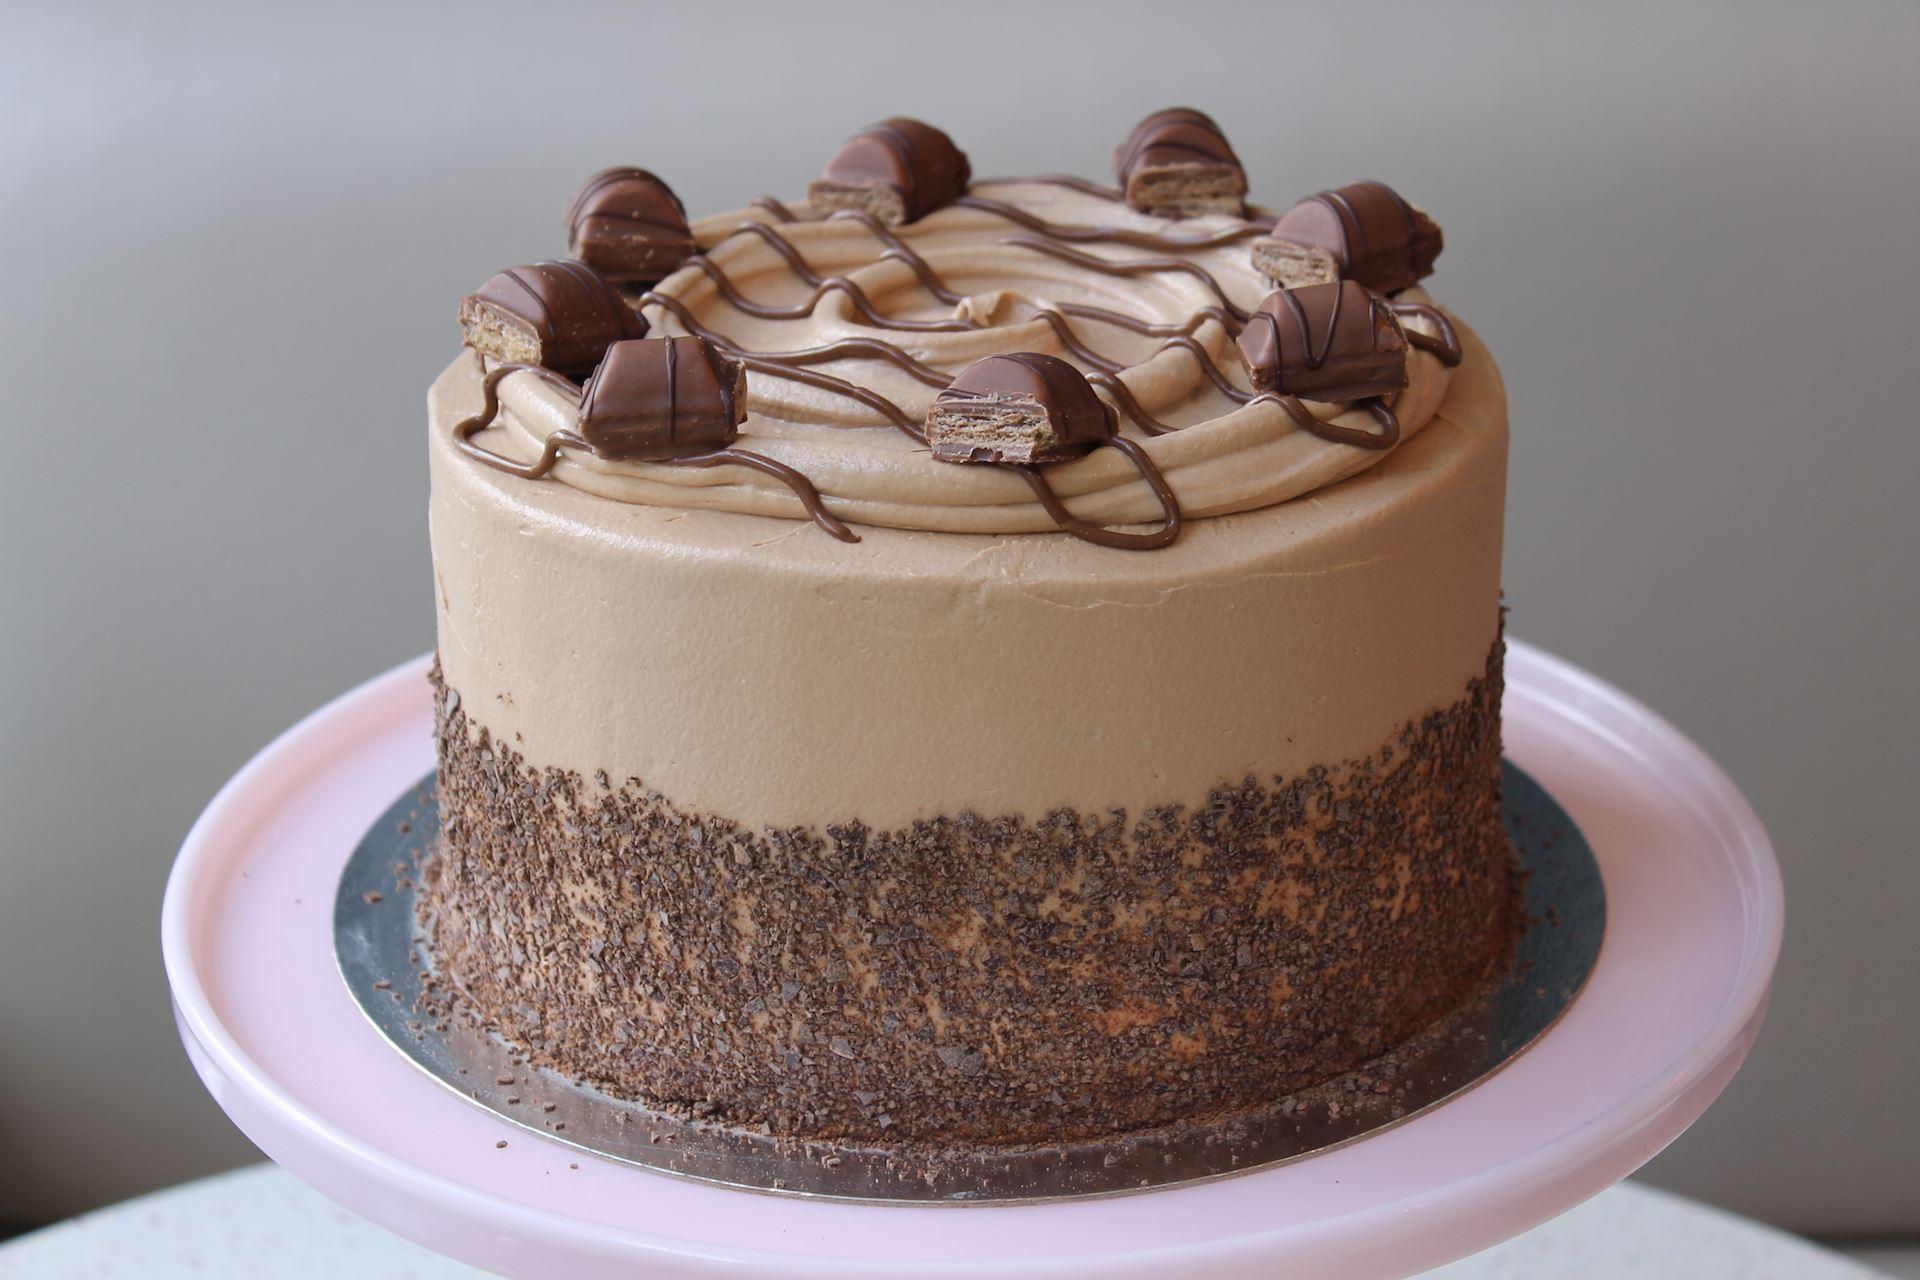 Decorating In White Kinder Bueno Layer Cake